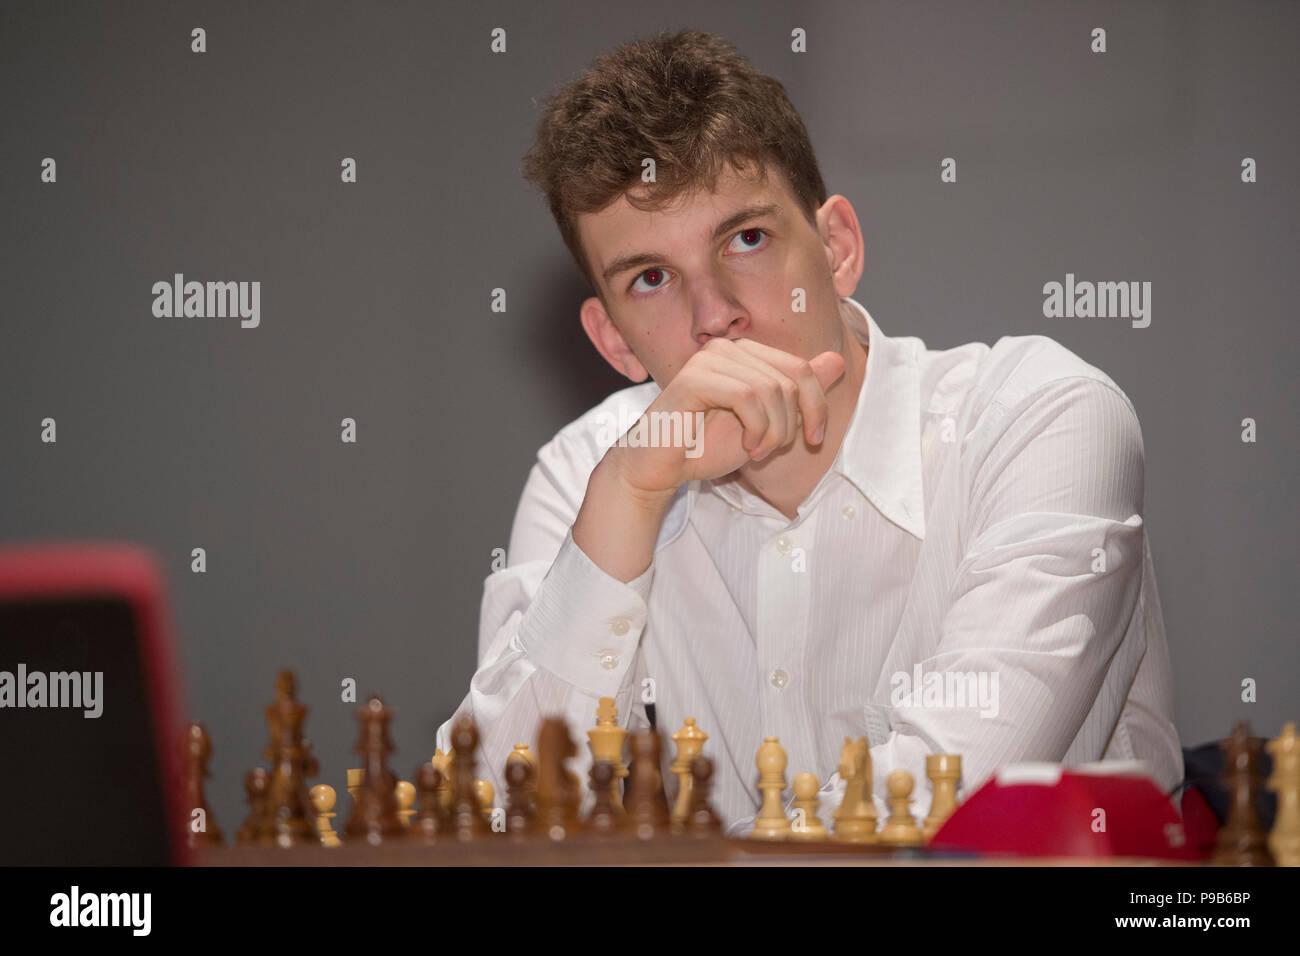 Jan Krzysztof Duda Poland Pol First Matchday Of The Sparkassen Chess Meeting 2018 On 14 07 2018 In Dortmund Usage Worldwide Stock Photo Alamy